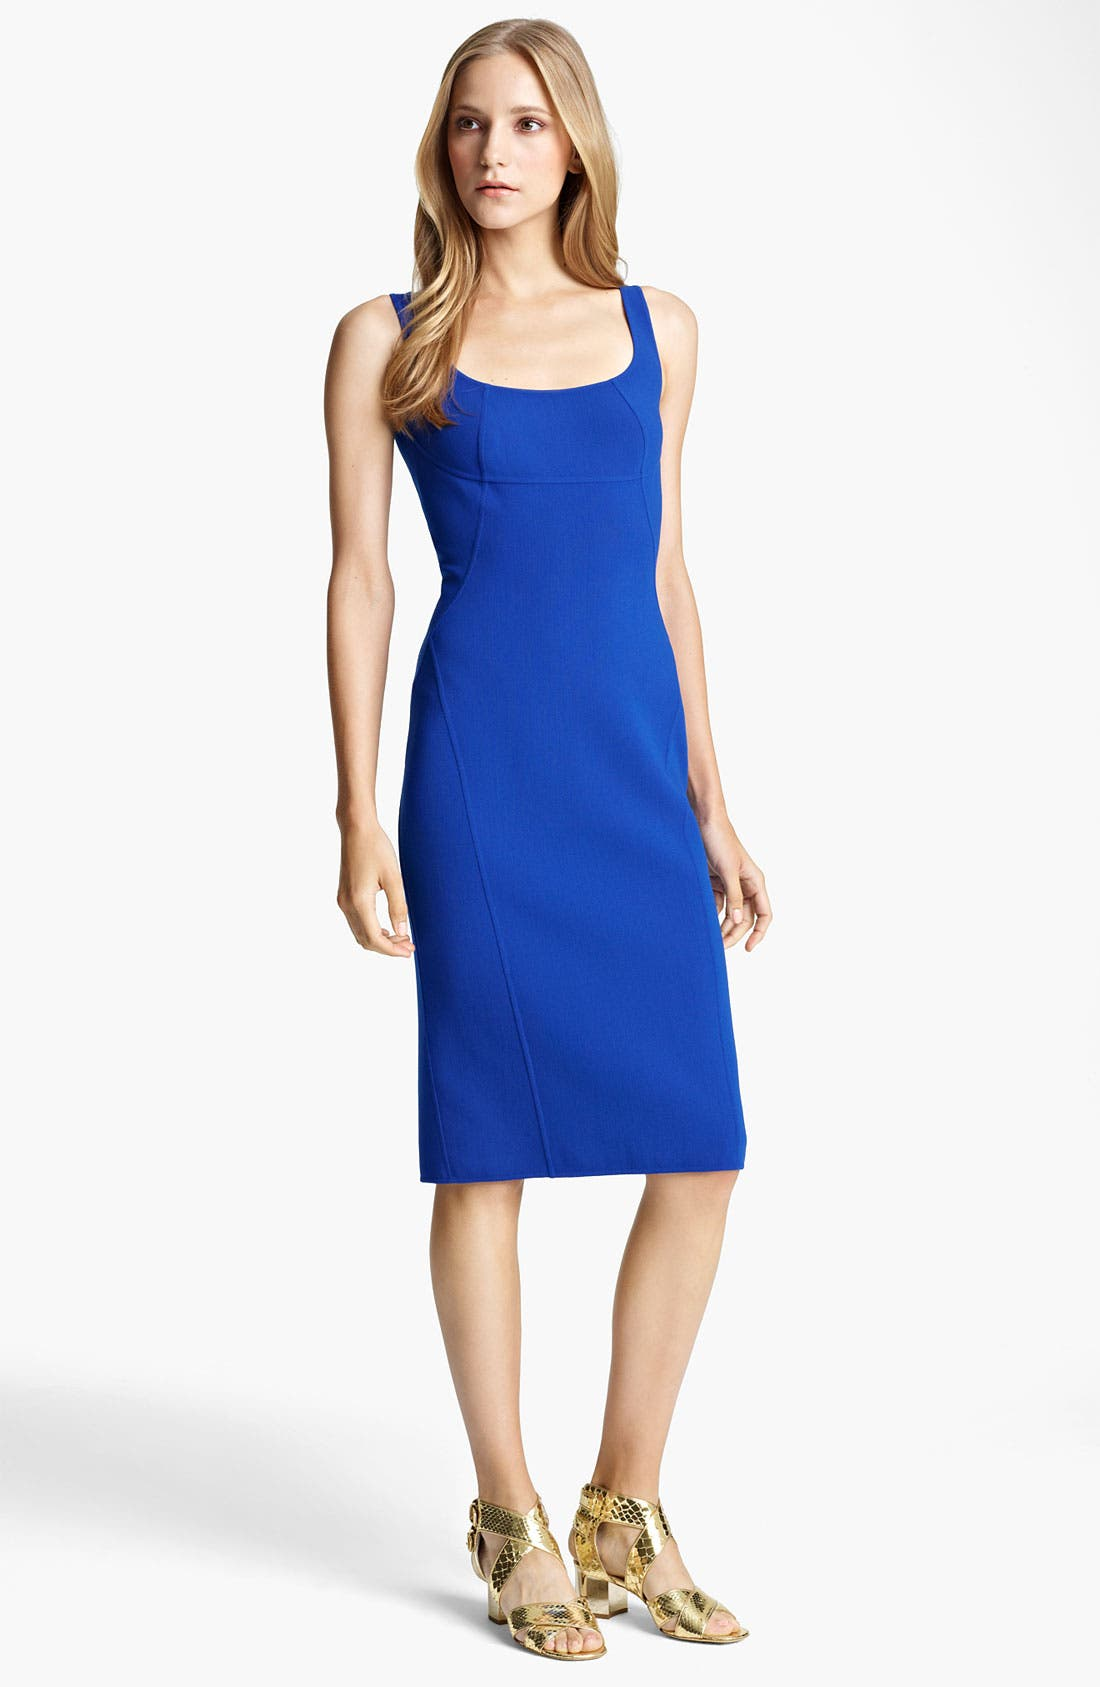 Alternate Image 1 Selected - Michael Kors Double Face Wool Crepe Dress